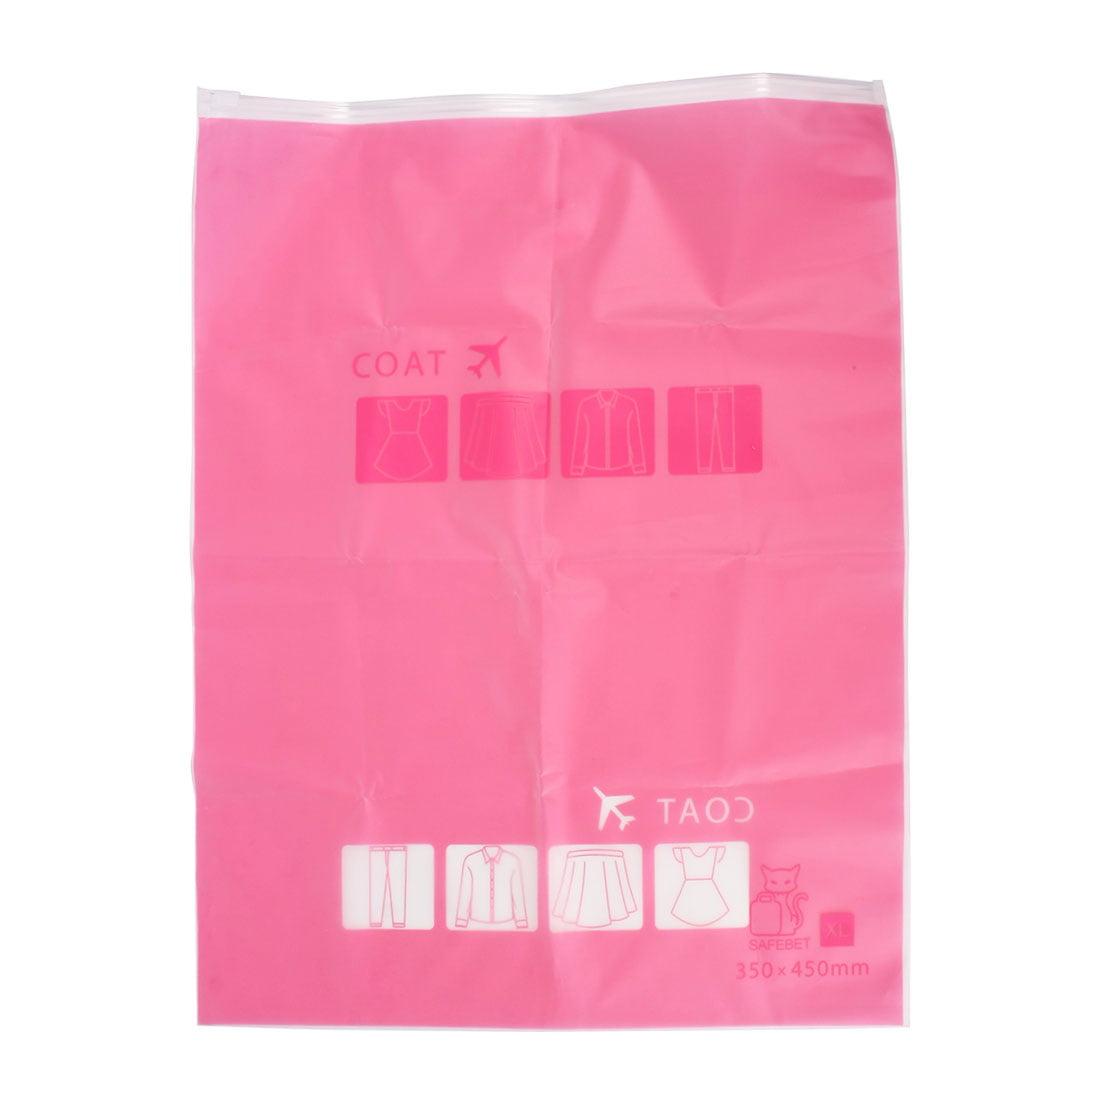 Plastic Water Resistant Travel Clothes Underwear Storage Bag 28x40cm Fuchsia - image 8 de 8